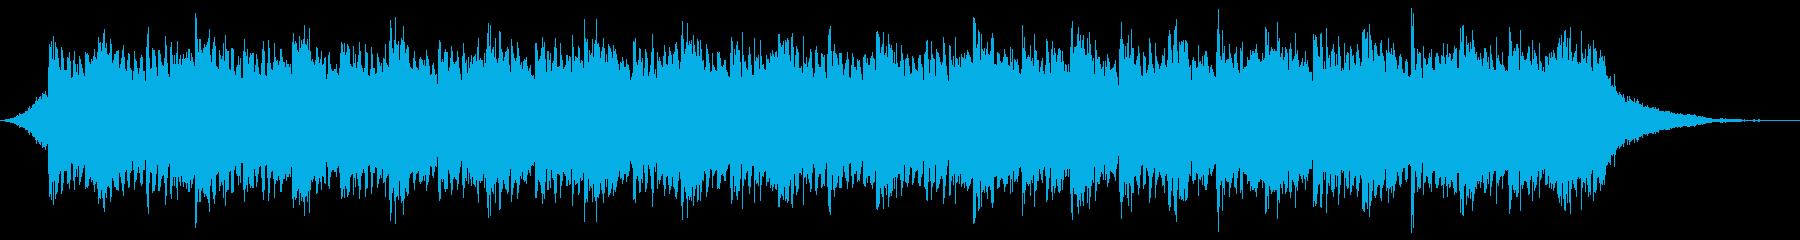 Cinematic Piano&Strings 3の再生済みの波形